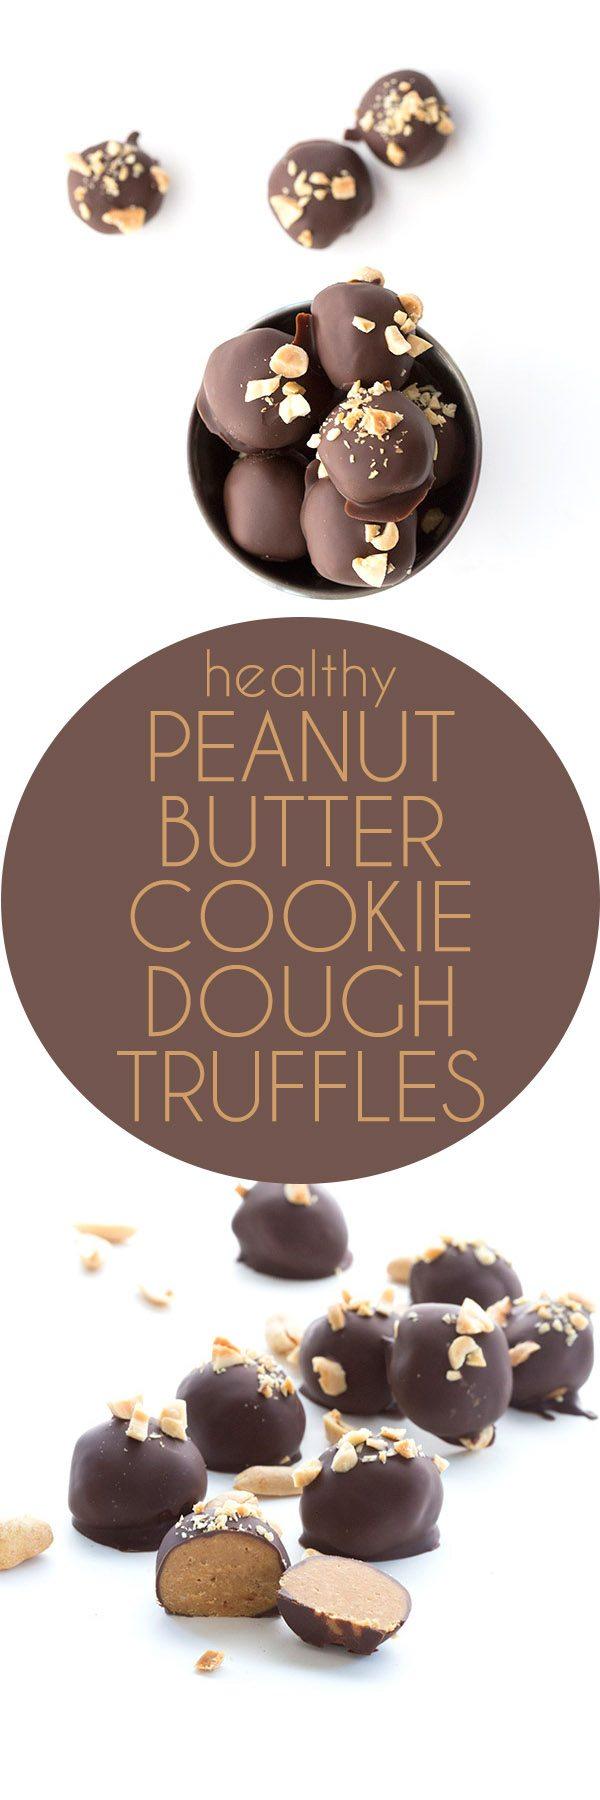 Healthy Low Carb Peanut Butter Cookie Dough Truffles - Keto THM Banting grain-free recipe